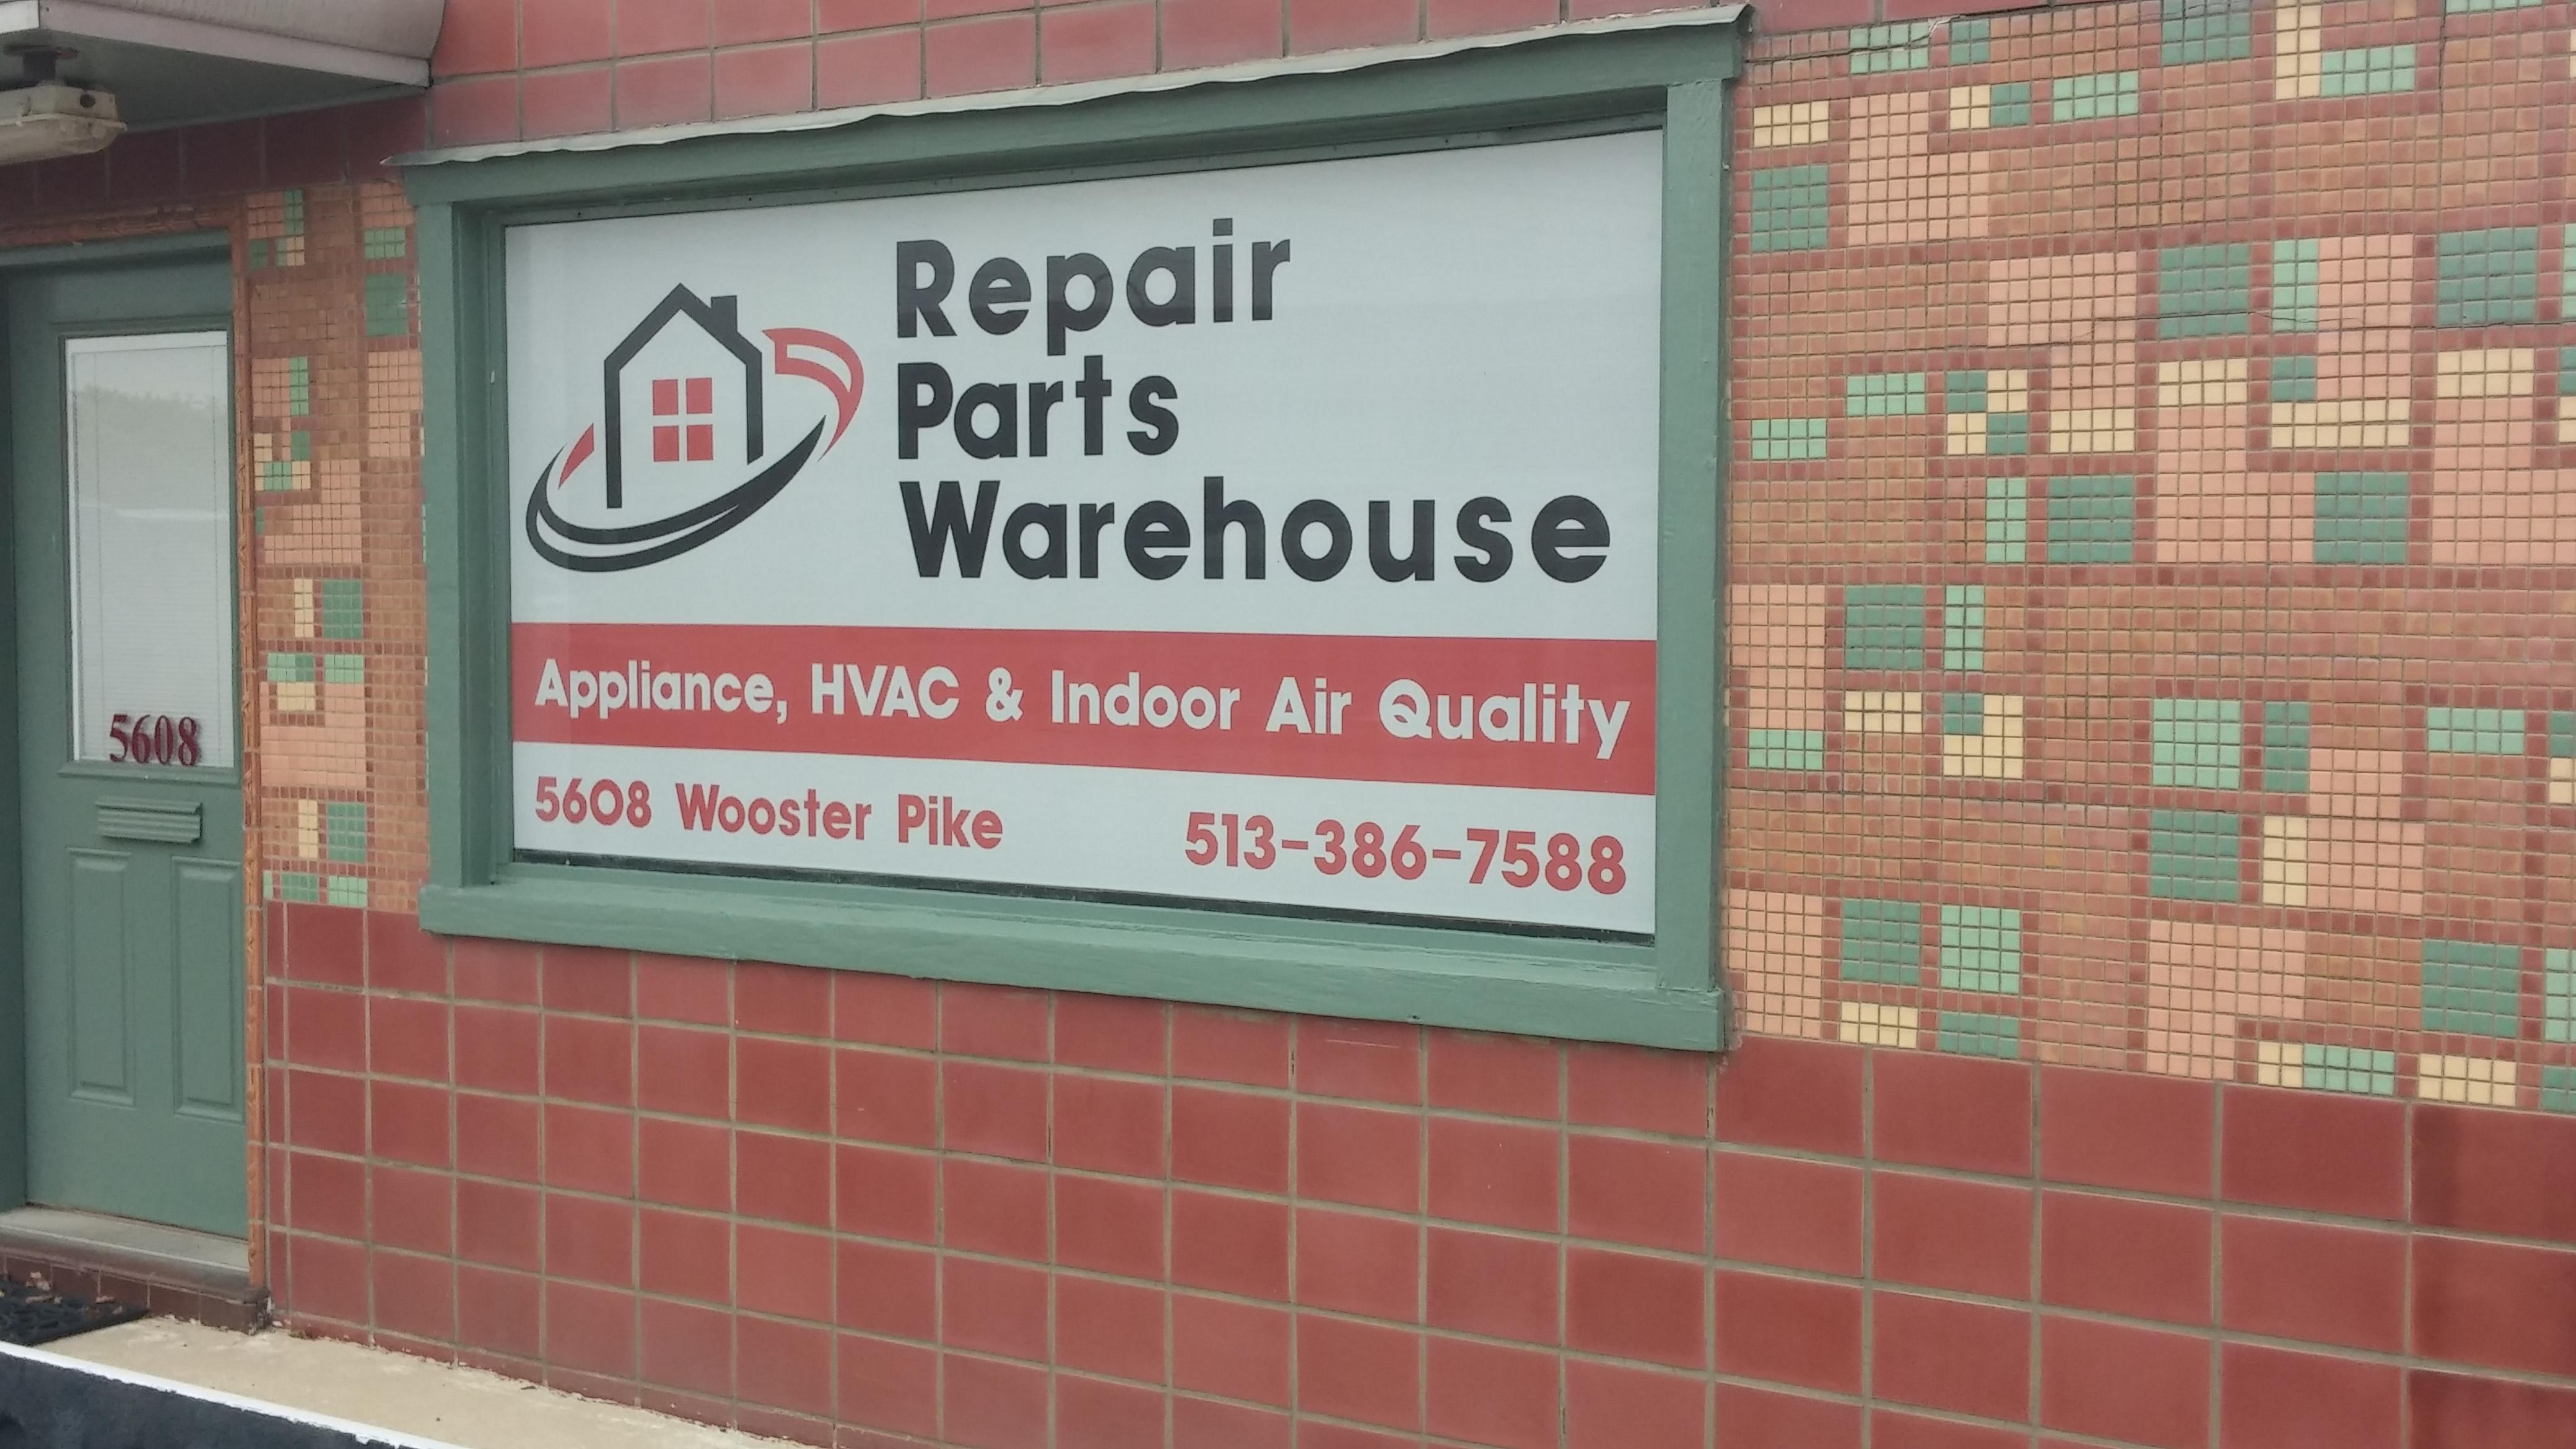 Repair Parts Warehouse 5608 Wooster Pike, Cincinnati, OH